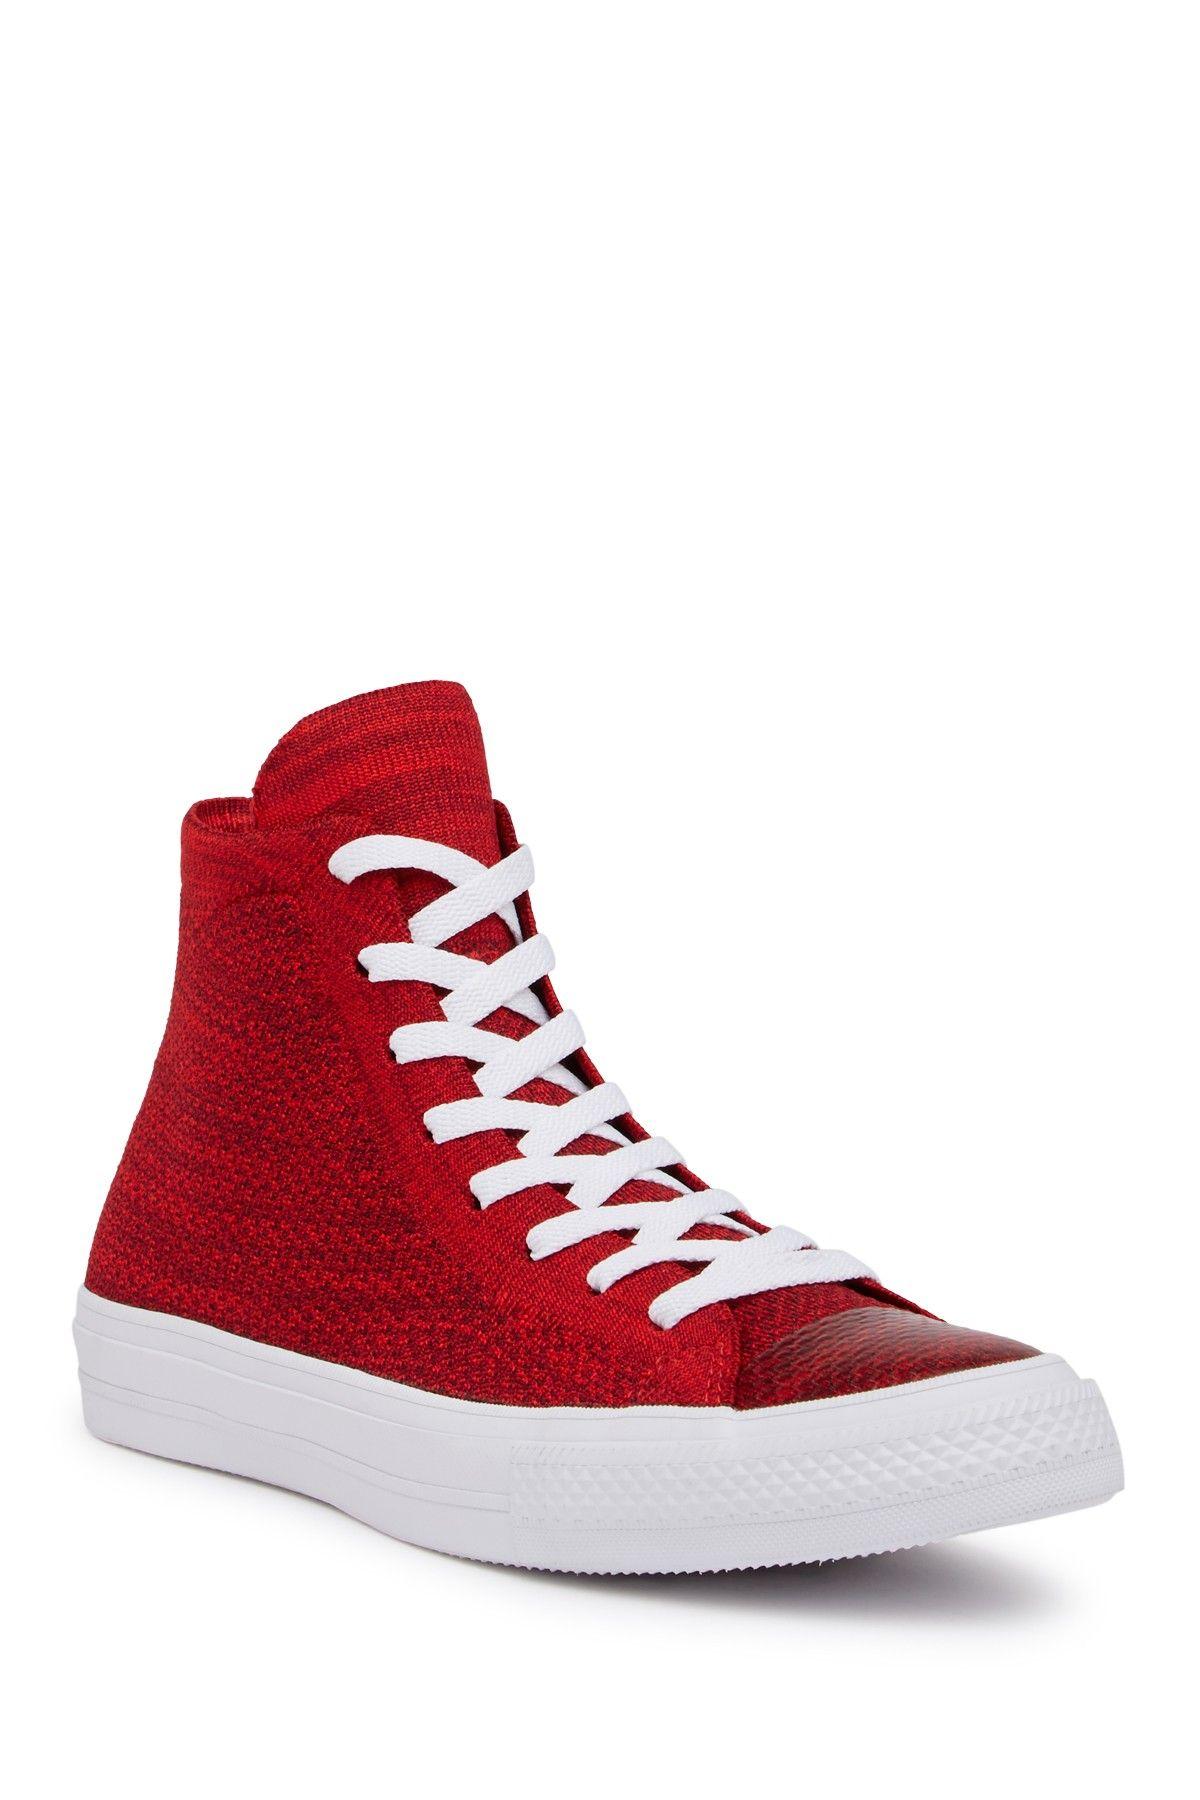 c4279db56a34 Converse Chuck Taylor All Star x Nike FlyKnit Hi-Top Sneaker (Unisex ...